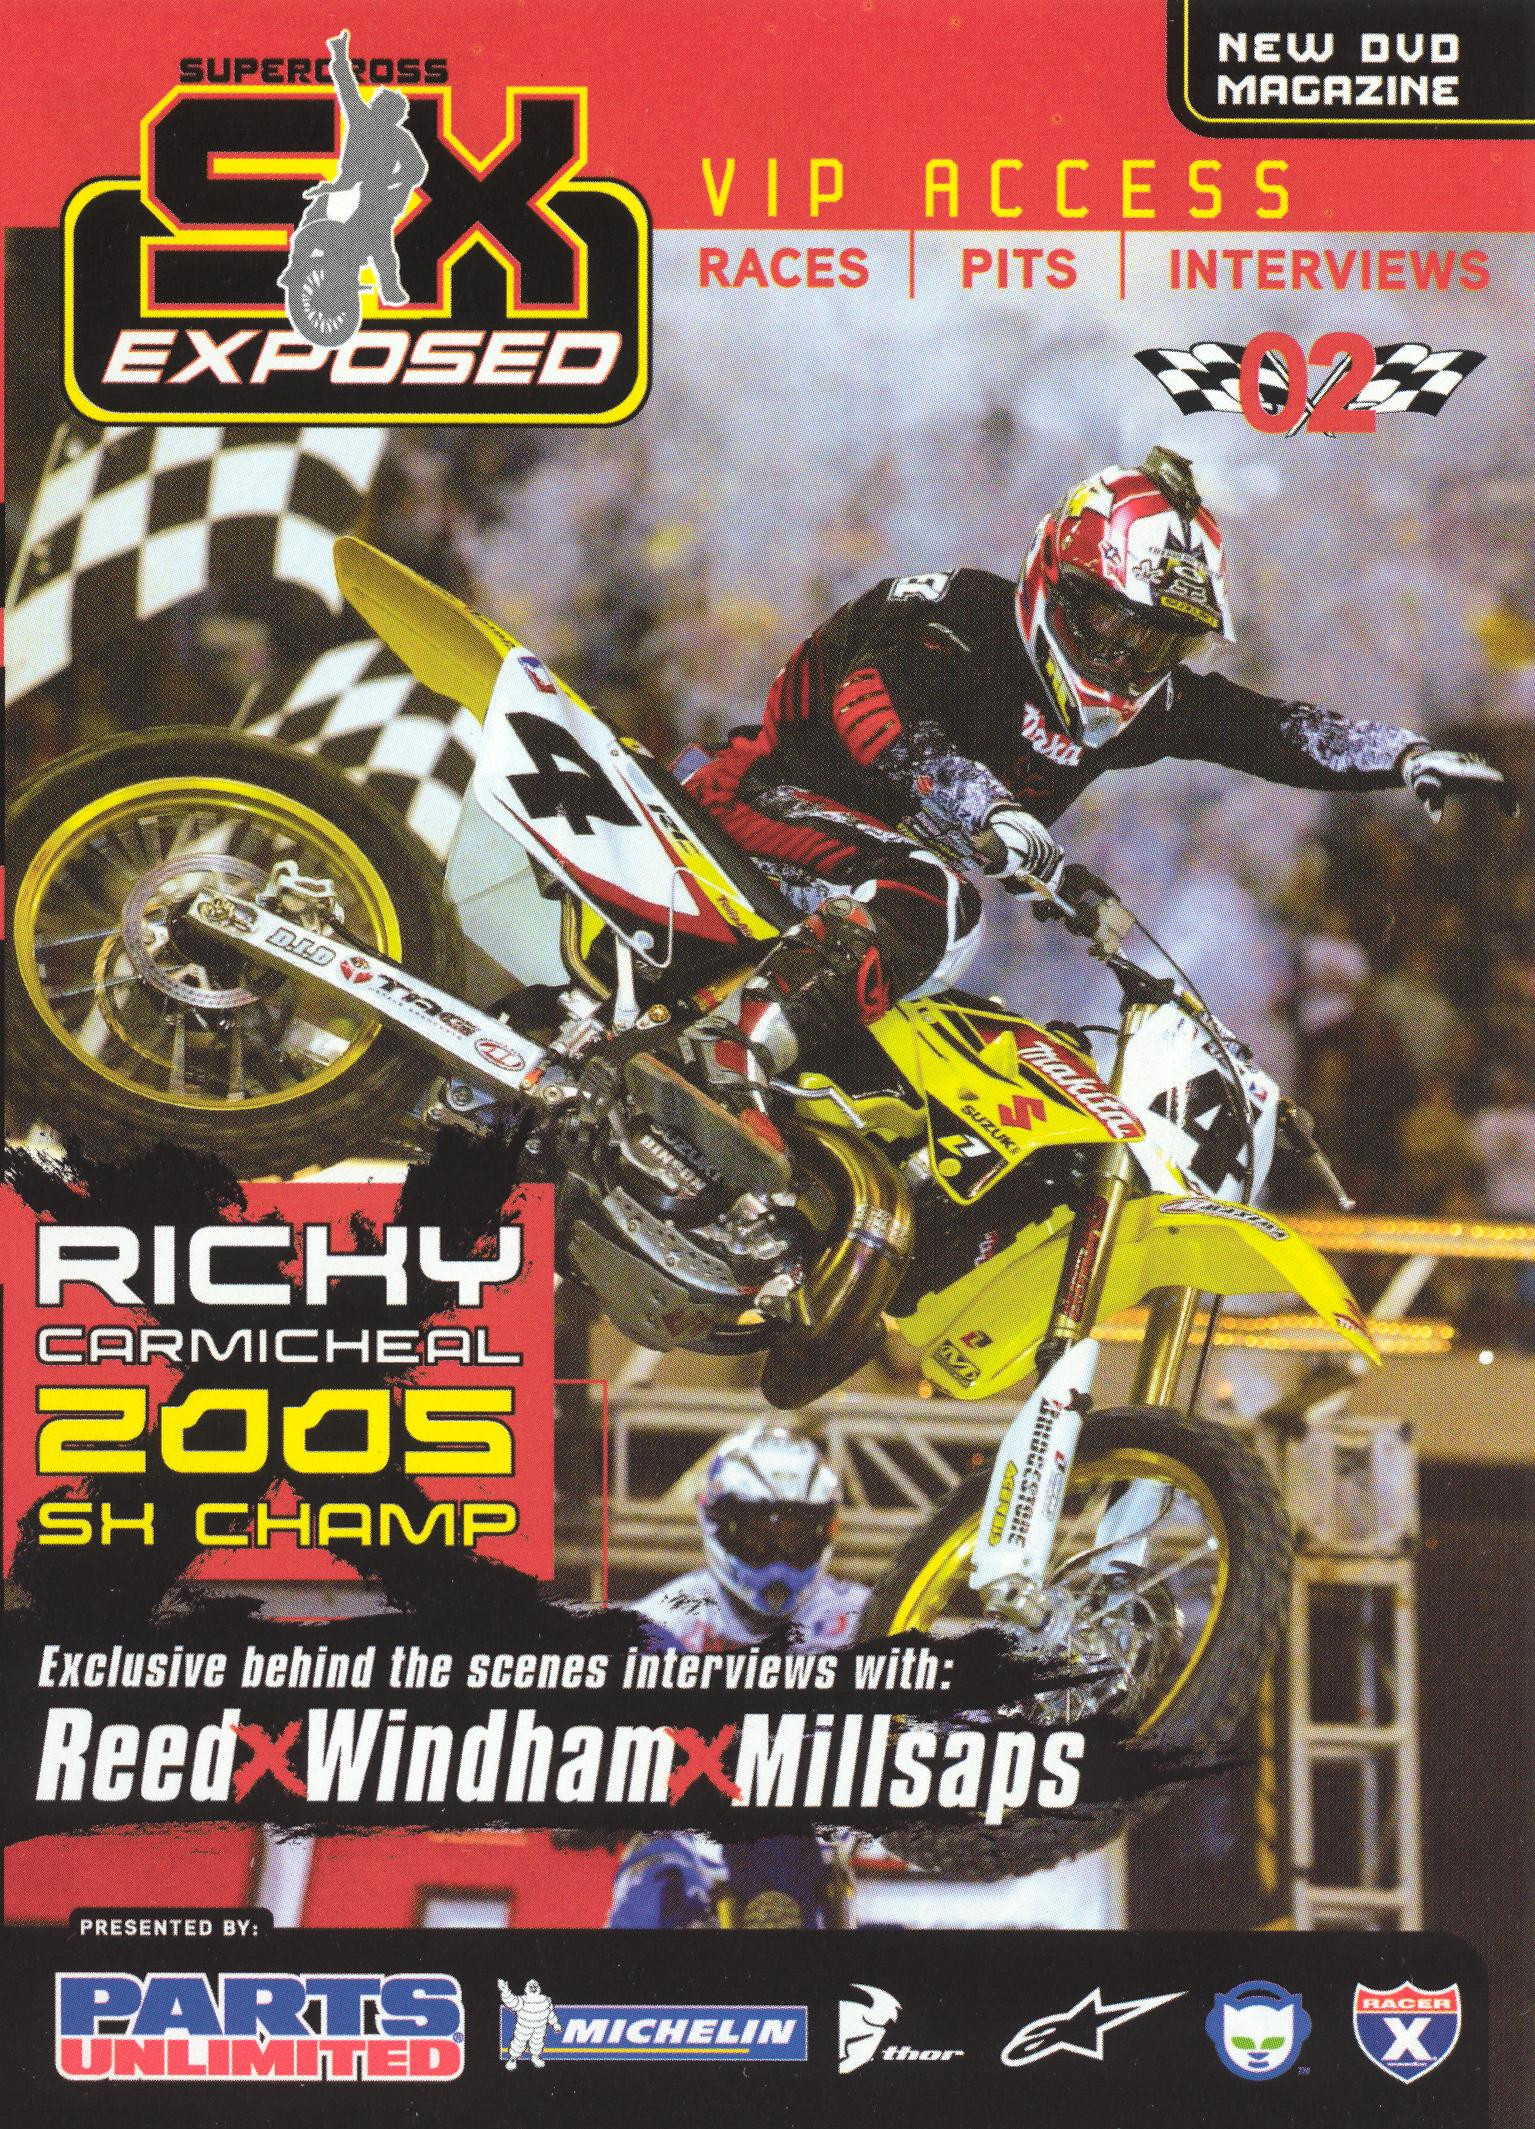 Supercross Exposed, Vol. 2